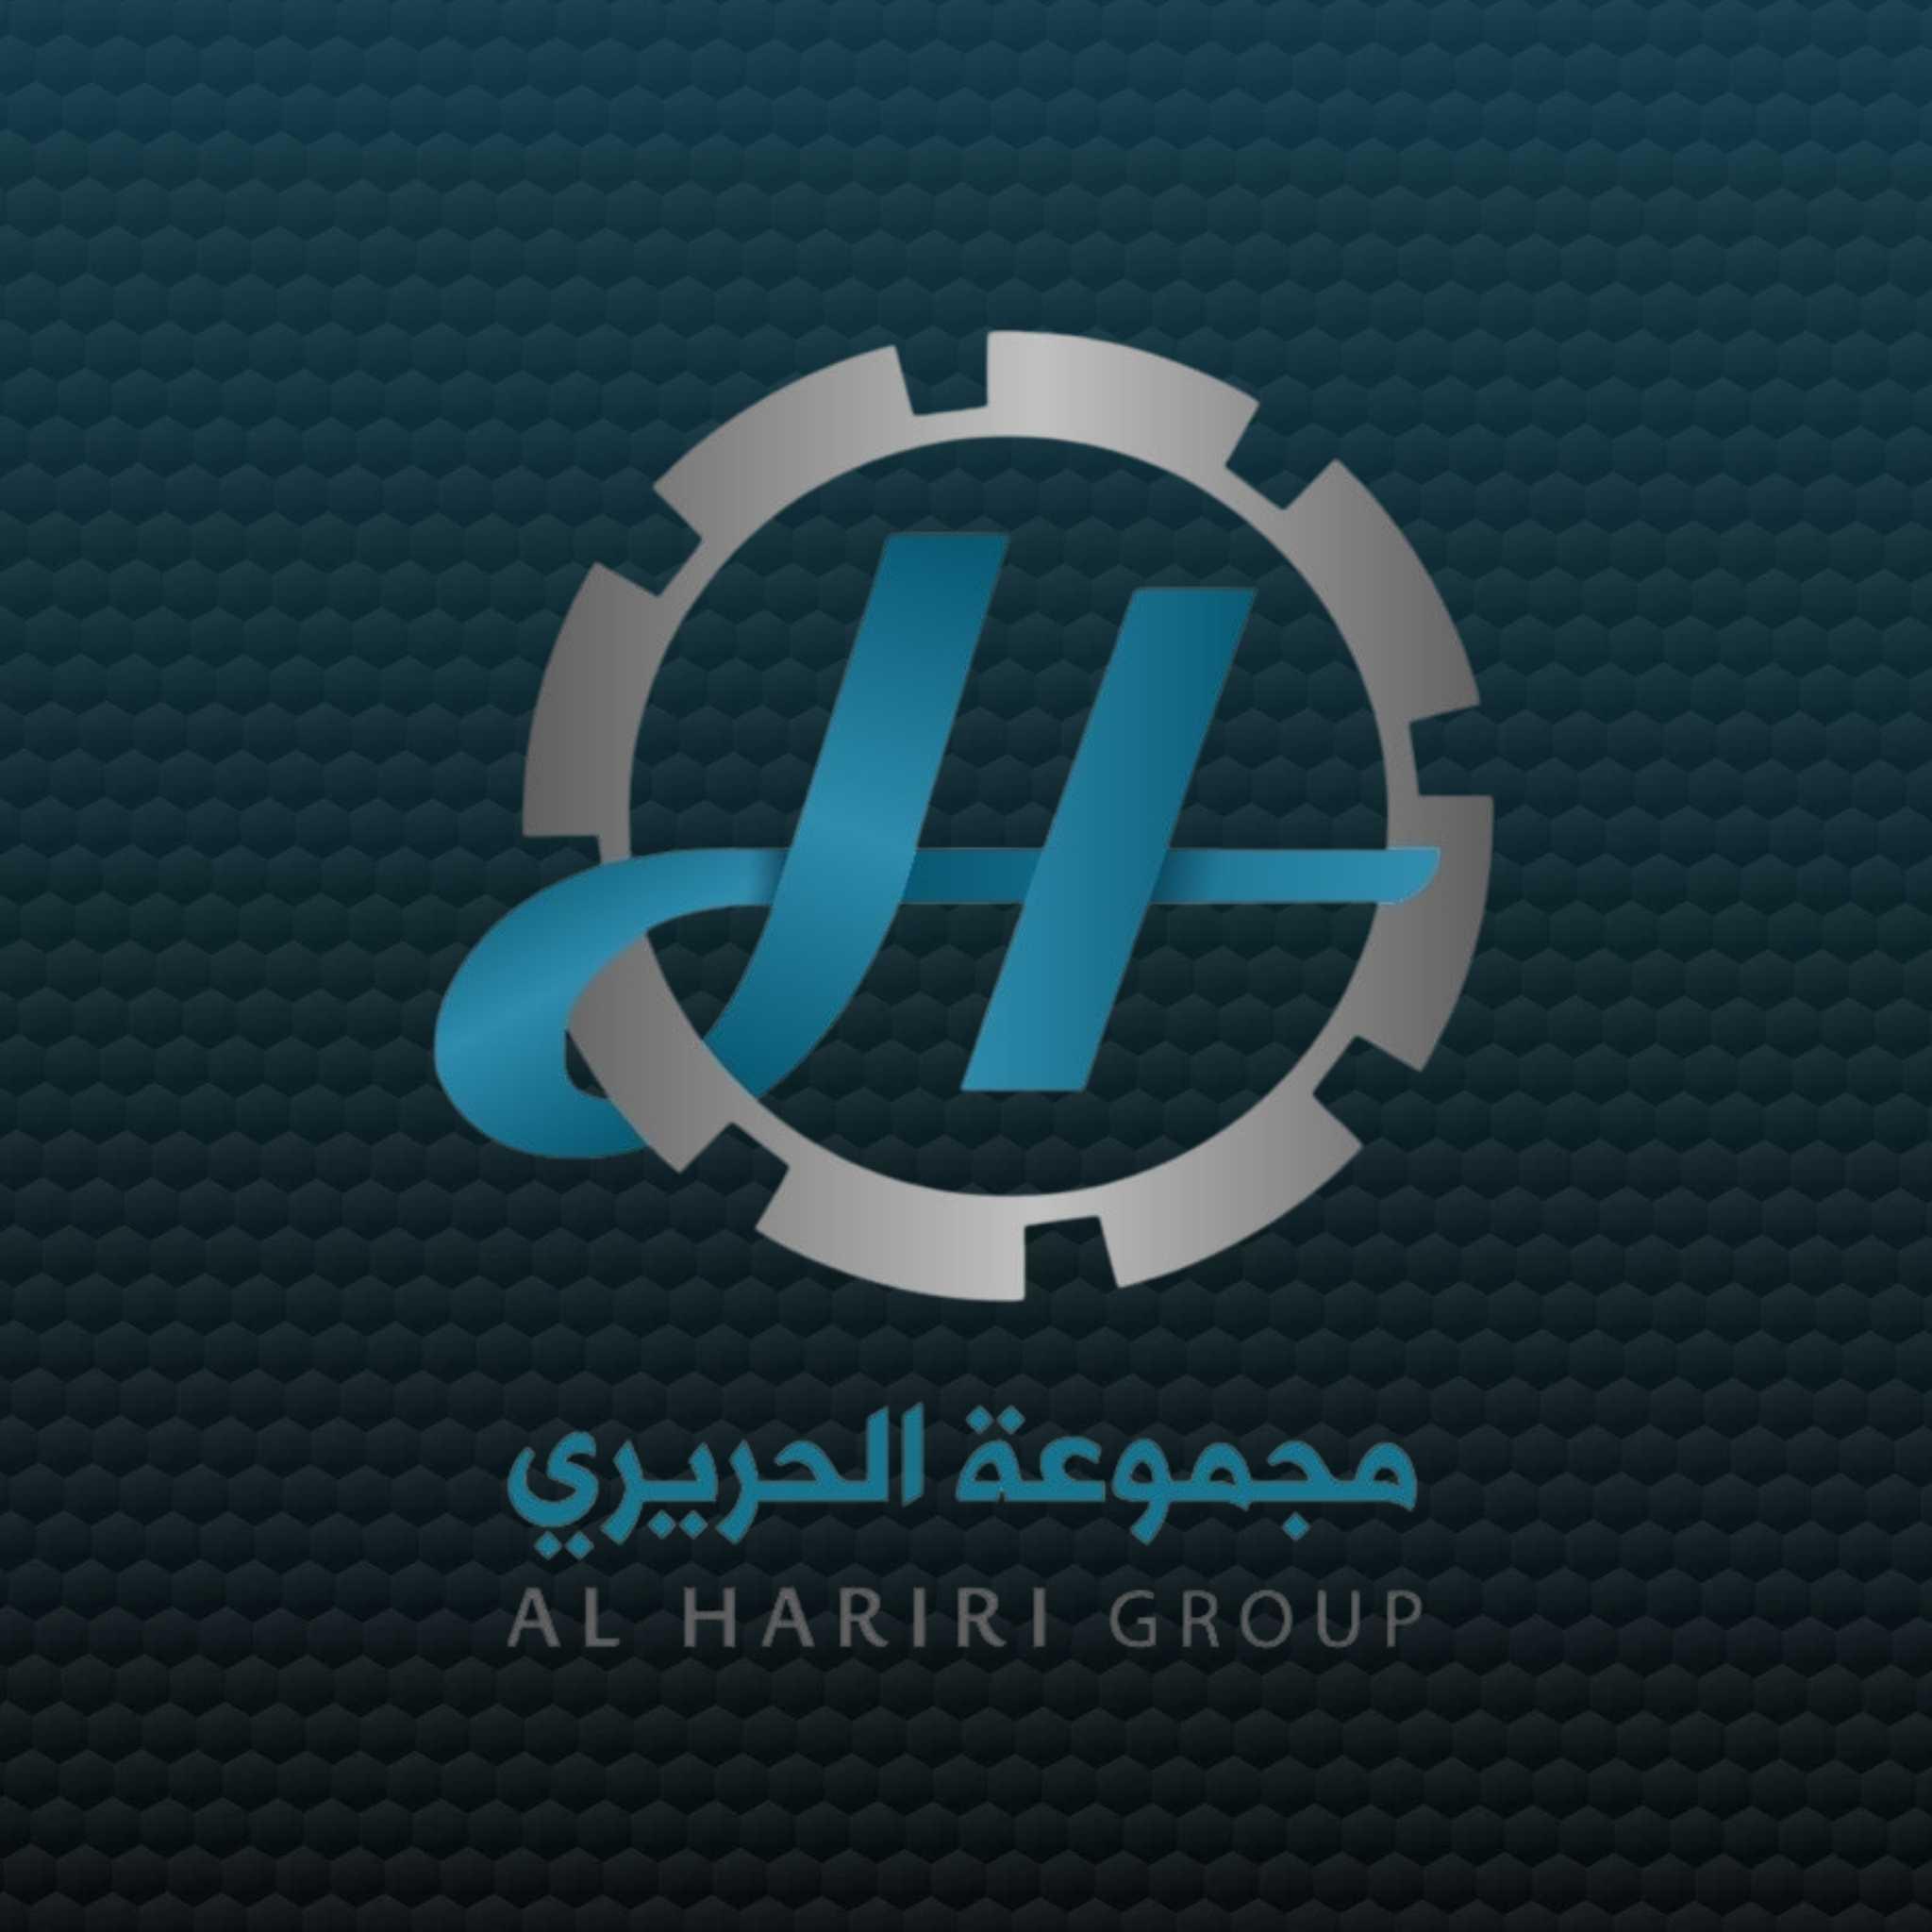 AlhaririGroup